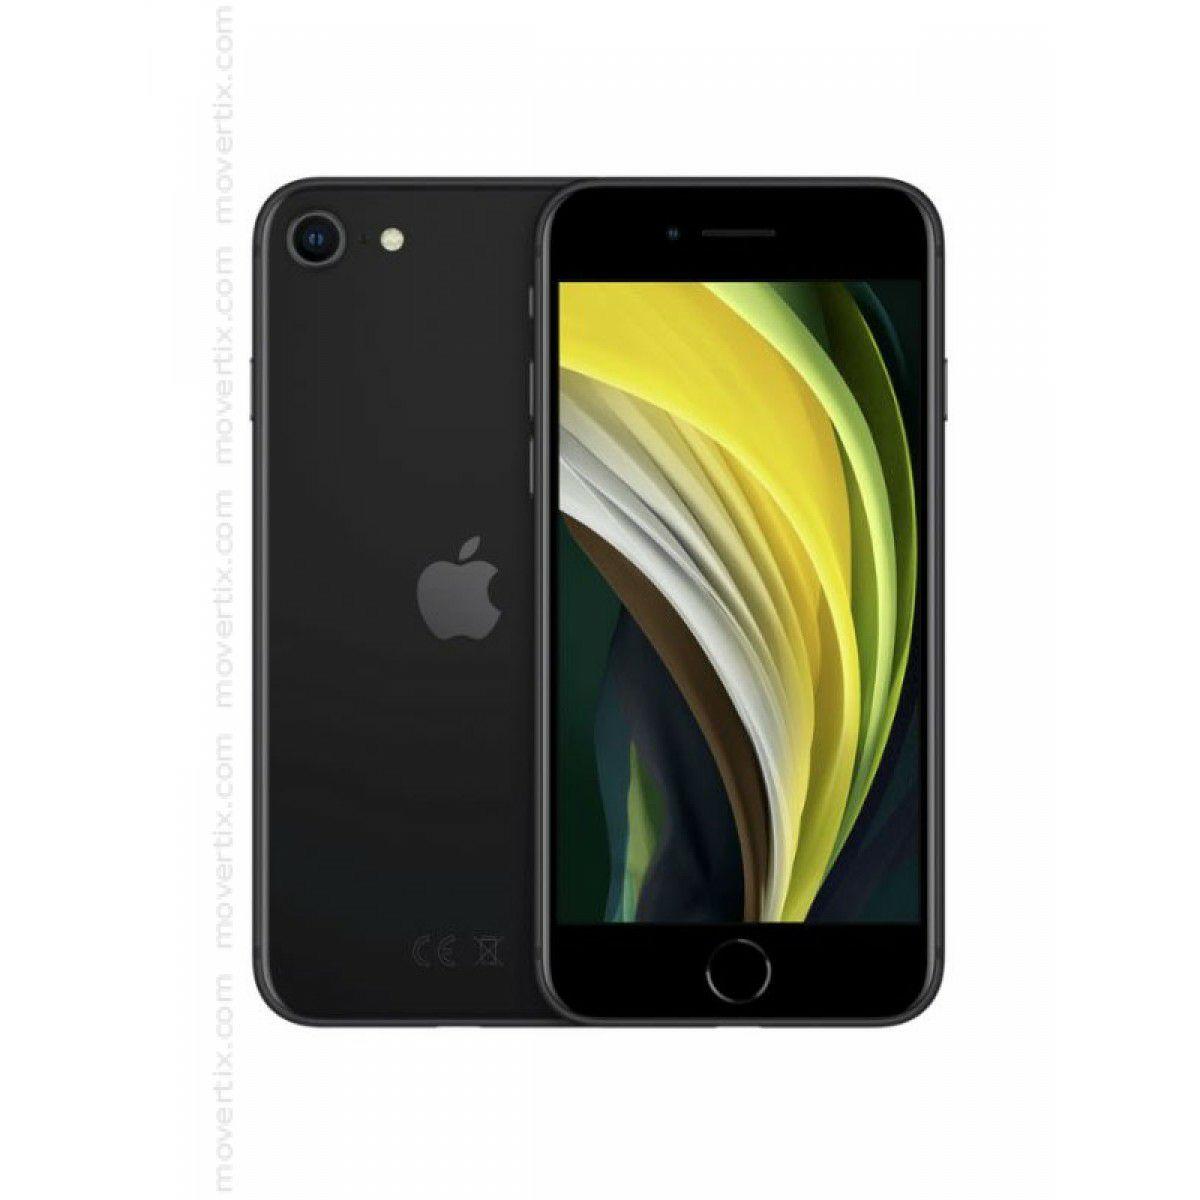 Smartphone Apple iPhone SE (2020) - Noir, 64 Go